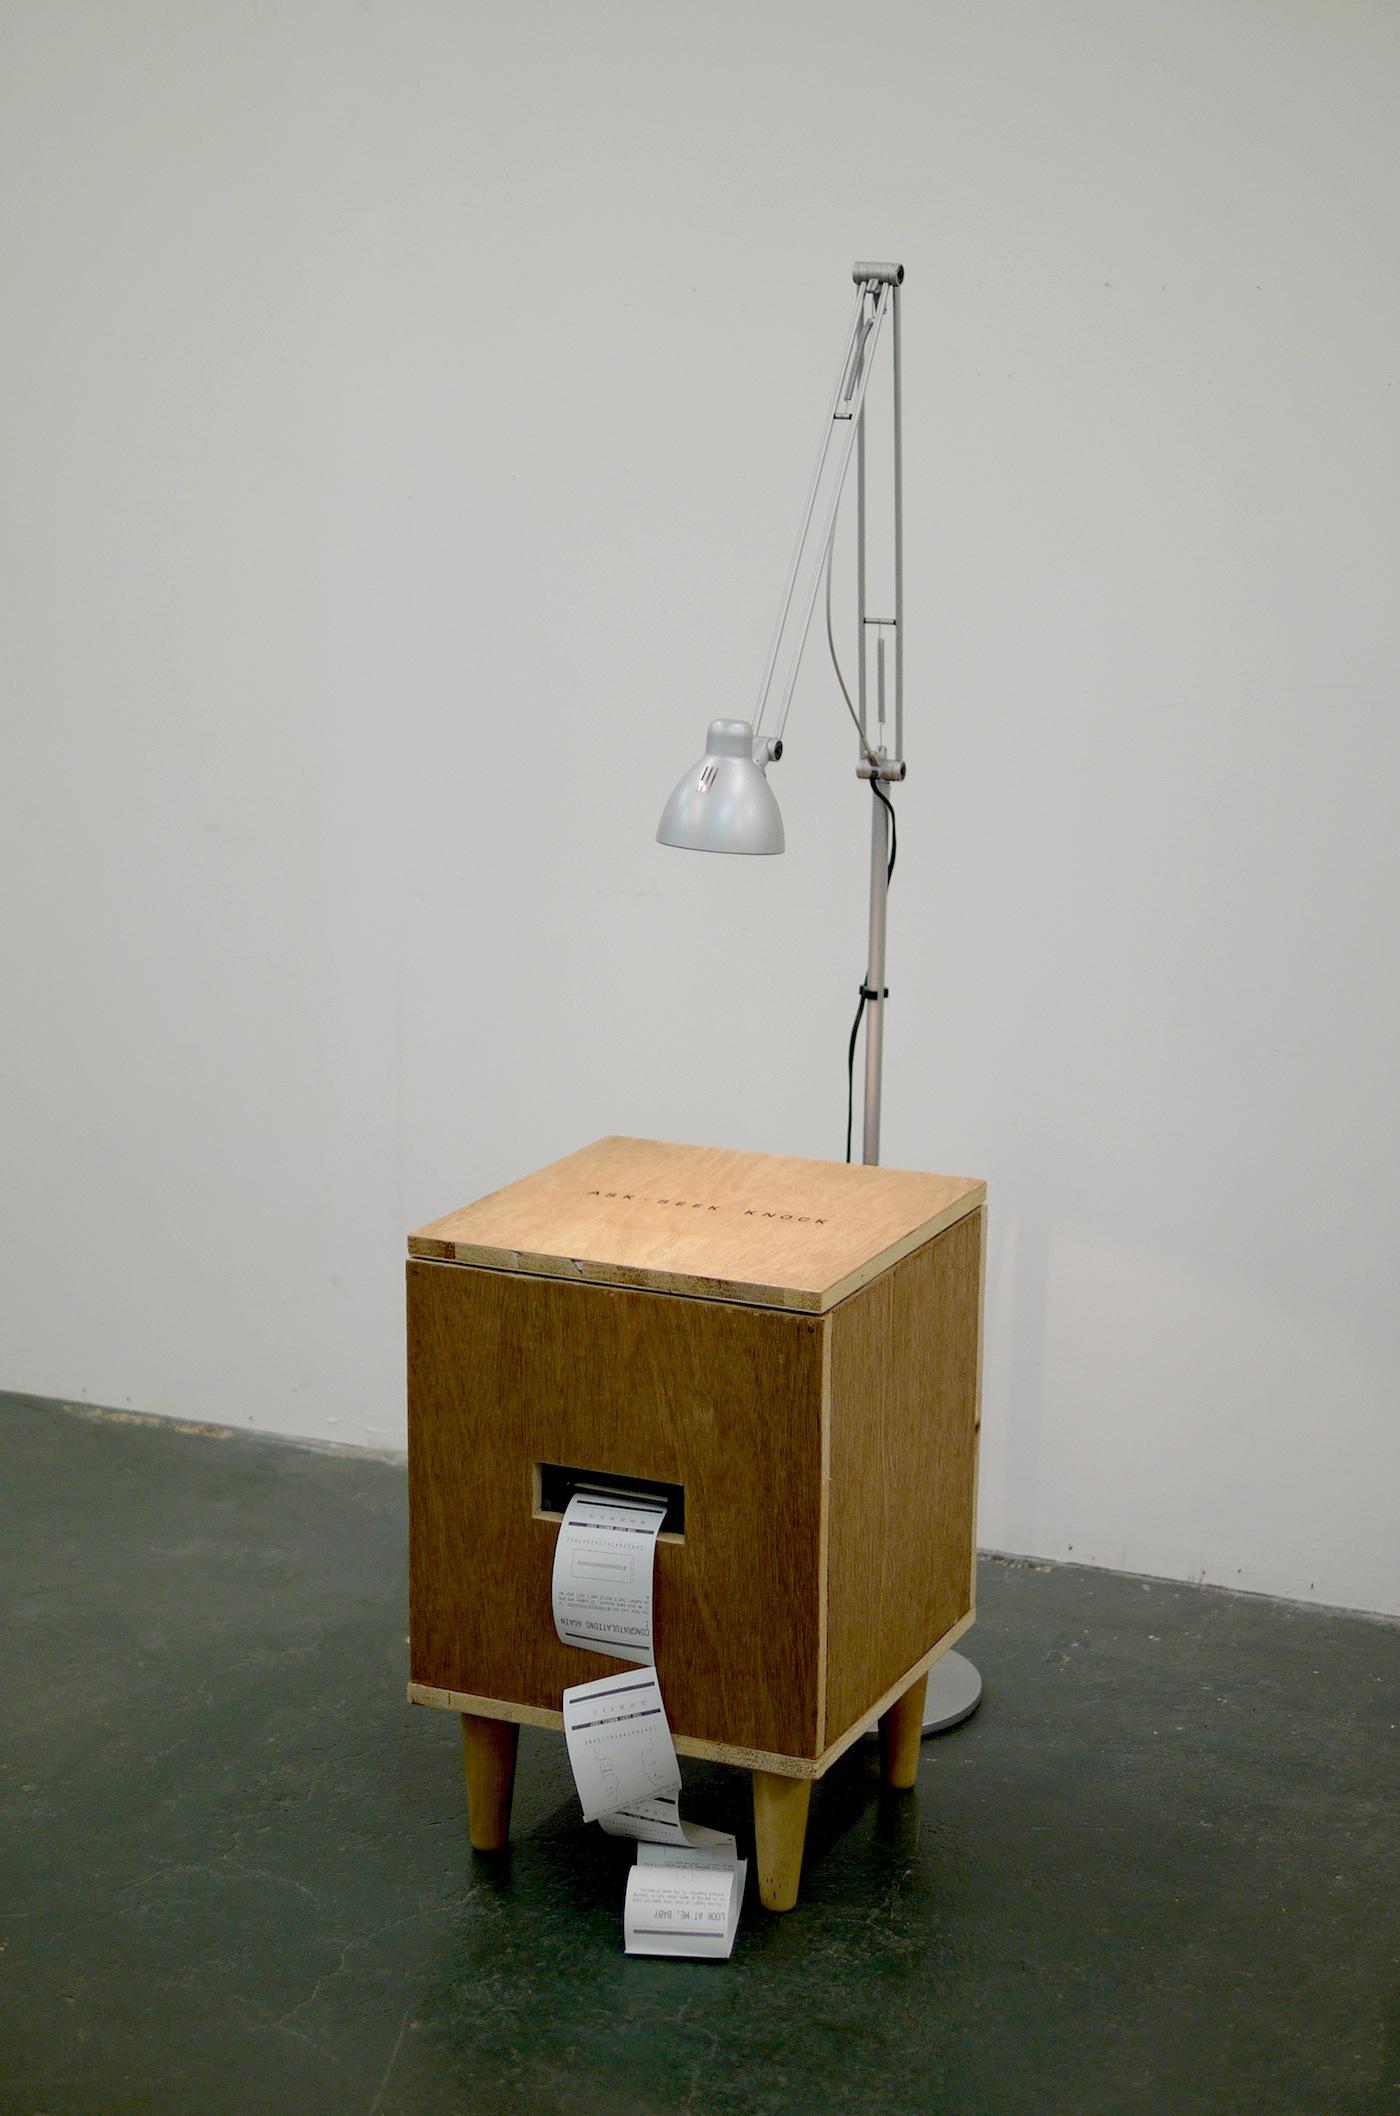 xBox<br>(2012)